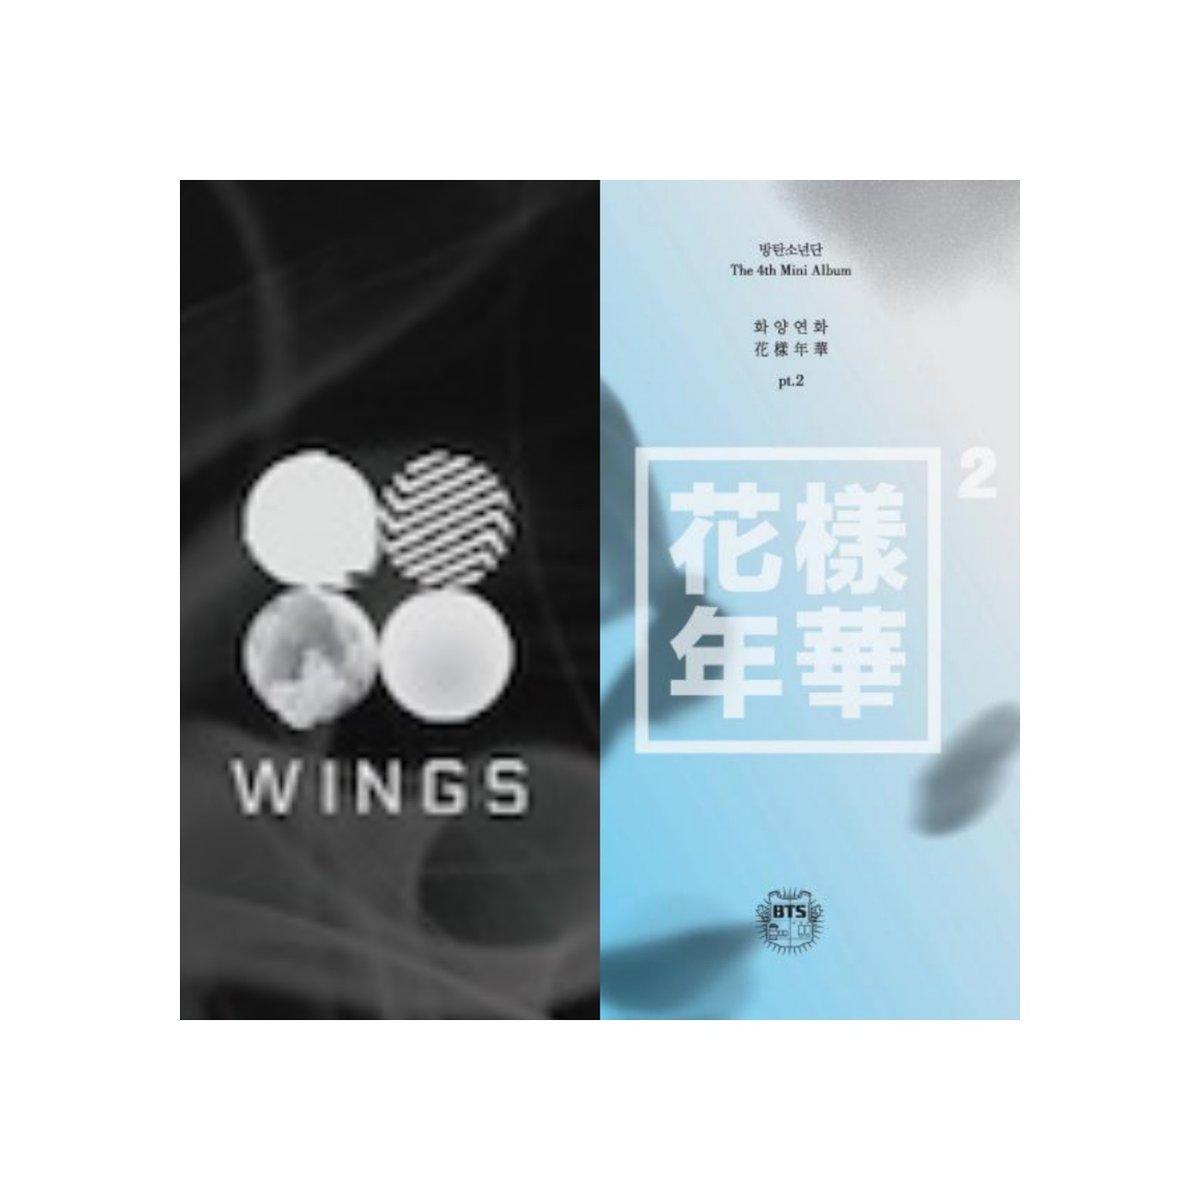 【#JINDay】Awake x Butterfly 【WINGS x 화양연화 pt. 2】 (cover) by 하늘  https://youtu.be/MtiFgywcgHA  ( @BTS_twt @bts_bighit ) #HappyJinDay #JINDay #TonightAndAlwaysWithJin #OurFlowerofDecember #SilverVoiceJin #VocalKingSeokjin #TonightYoureOurStar #JinOurHappiness